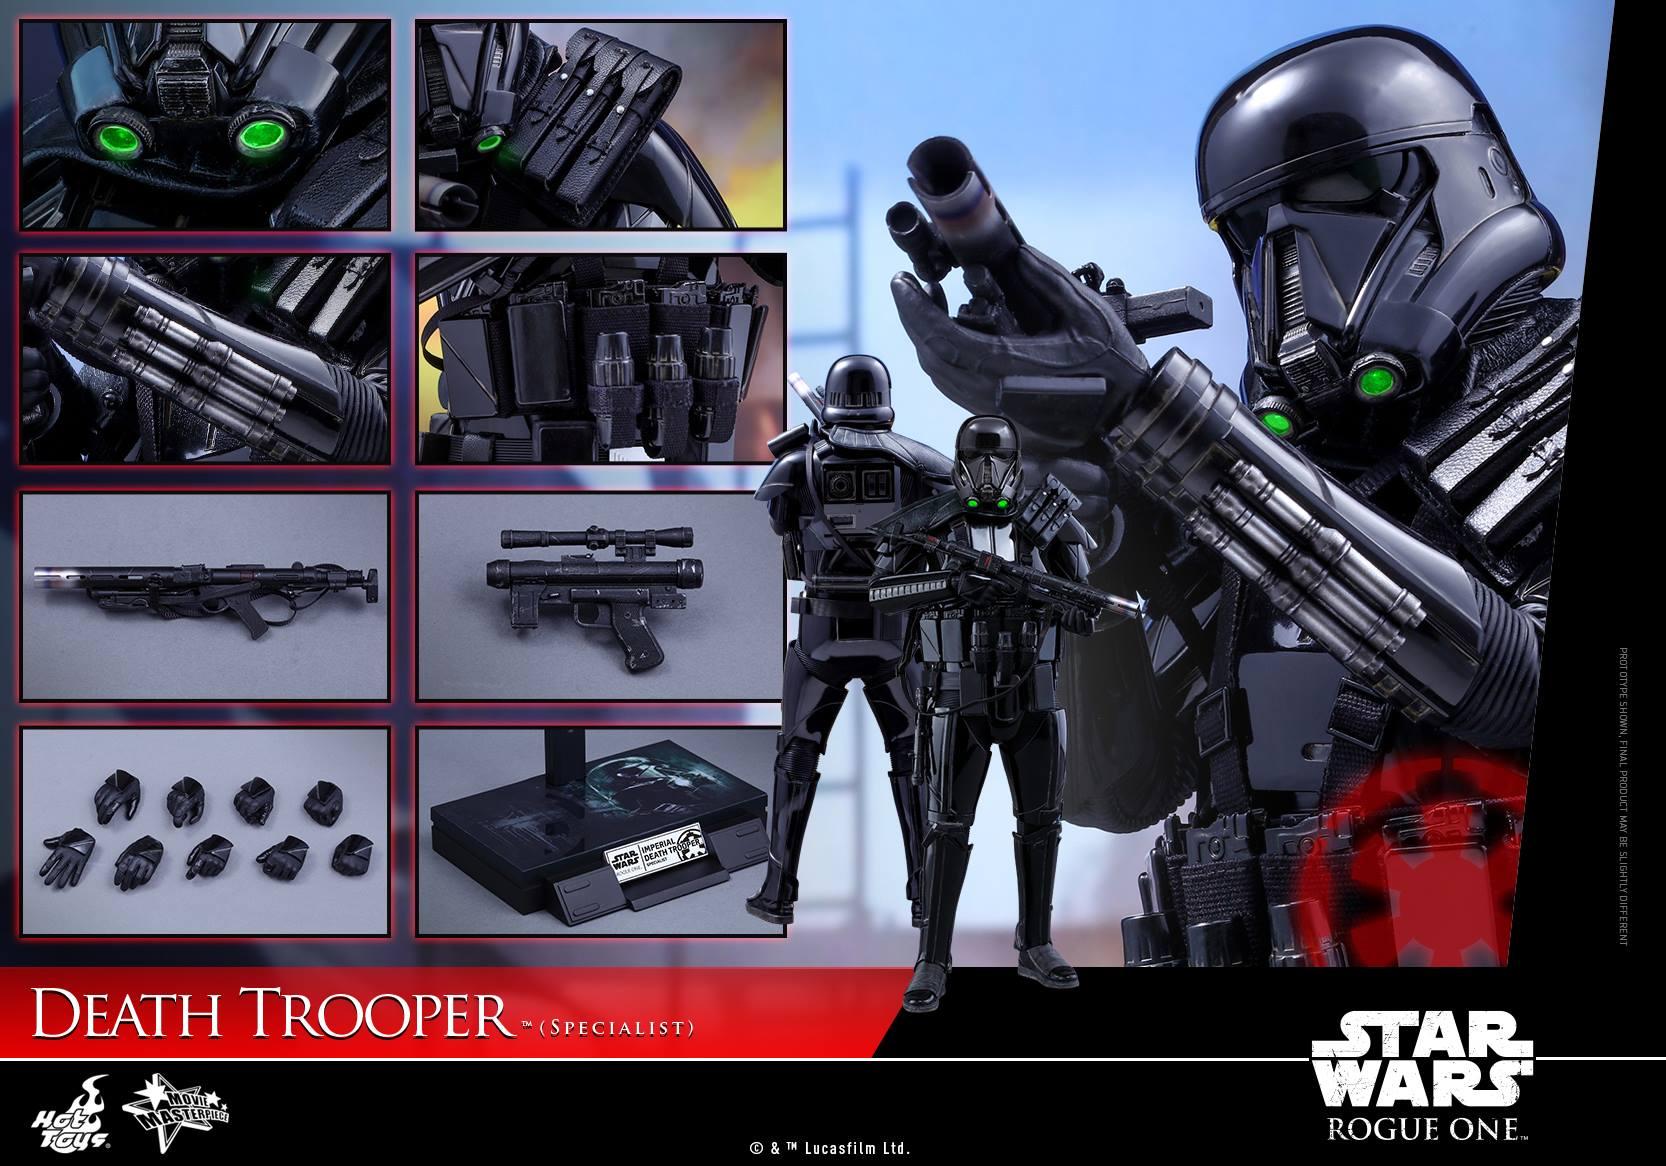 ht-deathtrooper22